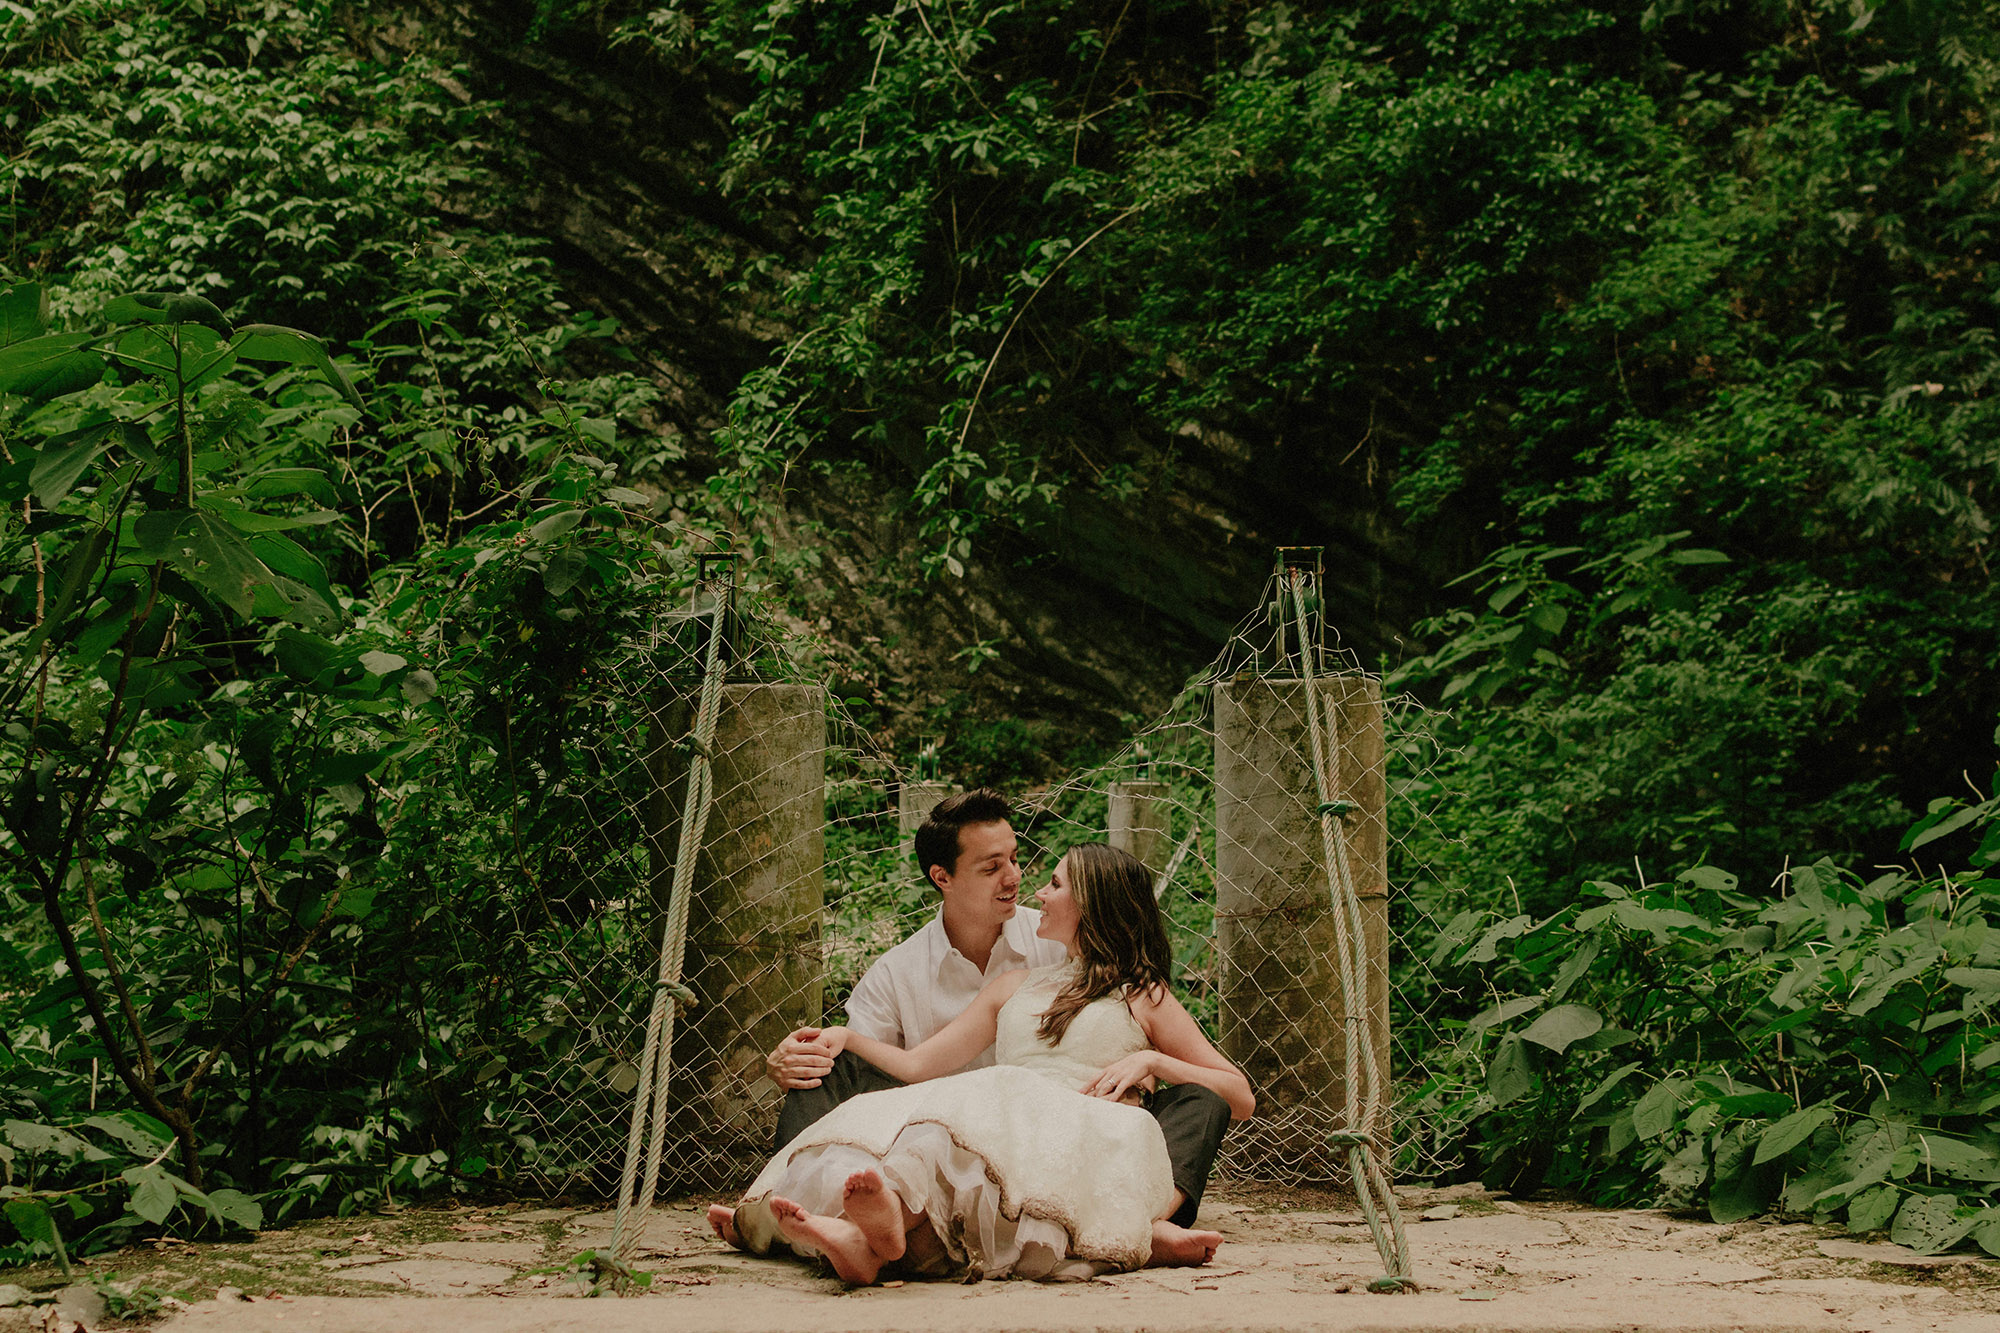 fer juan luis trash the dress fotografo de bodas 10.jpg